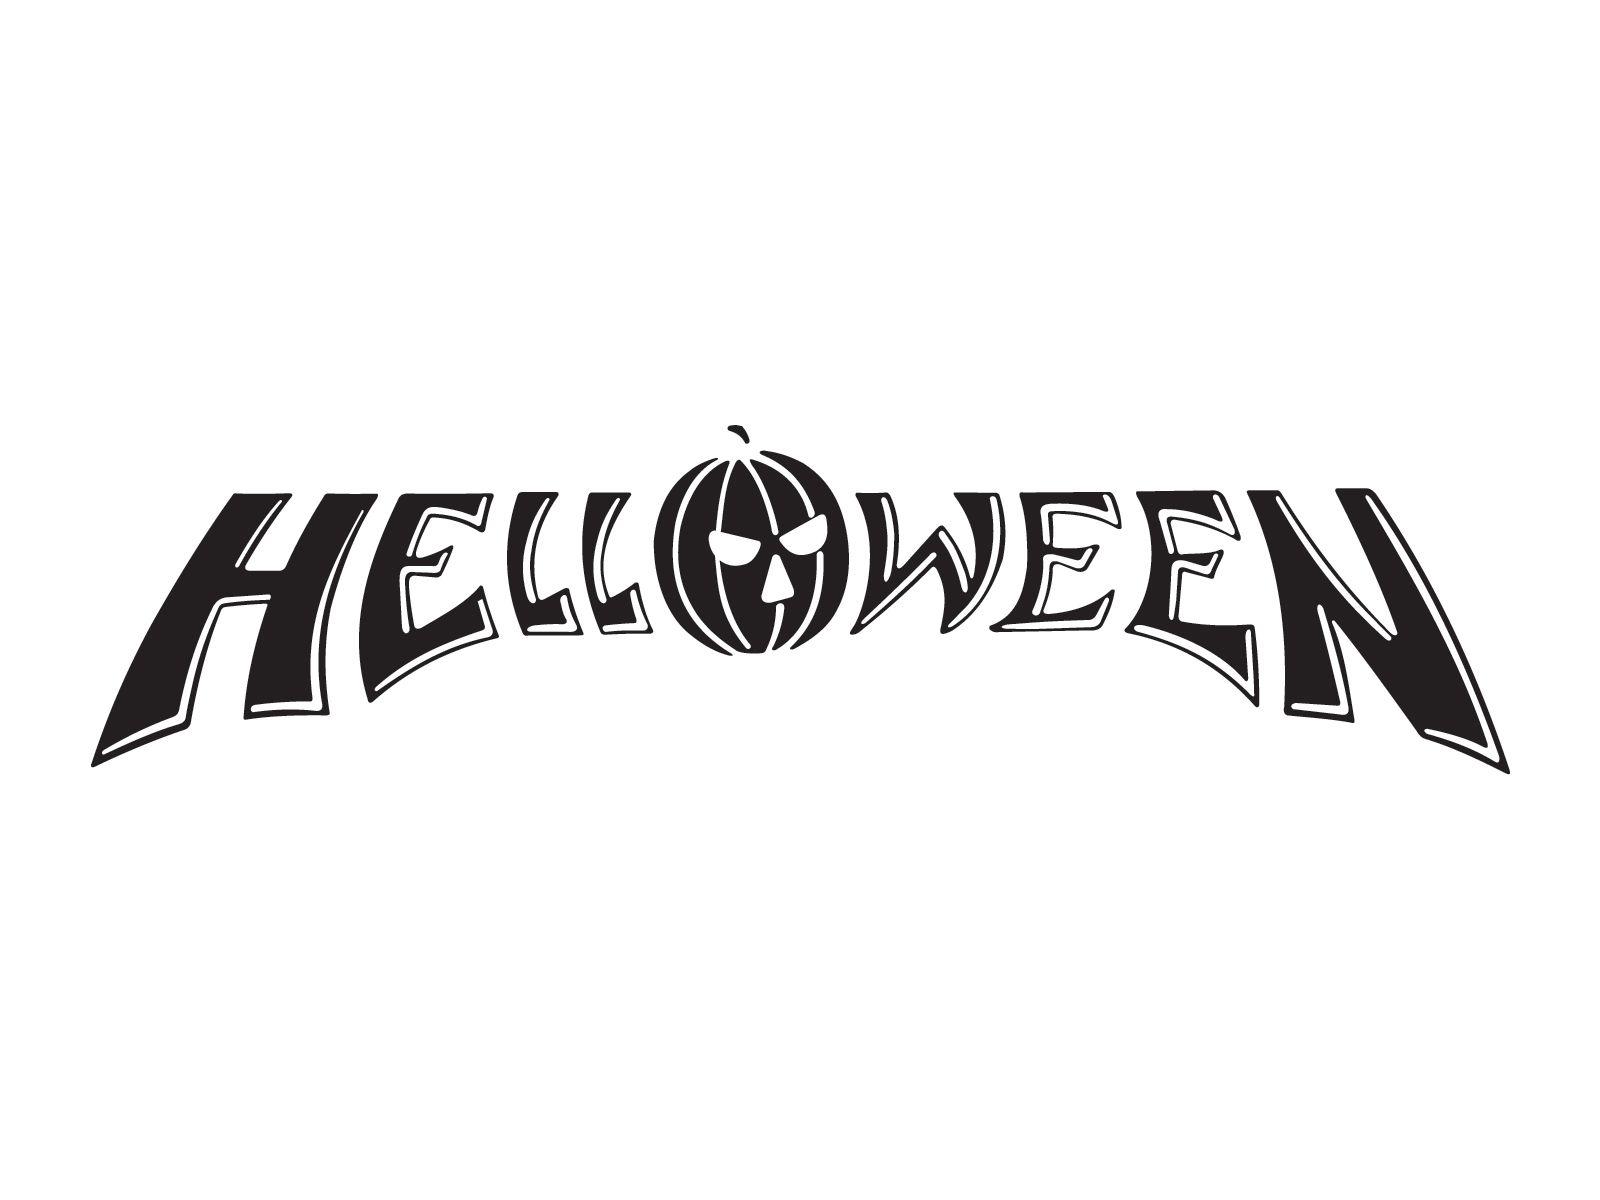 Helloween Logo Wallpaper Metal Band Logos Heavy Metal Music Rock Bands Logos